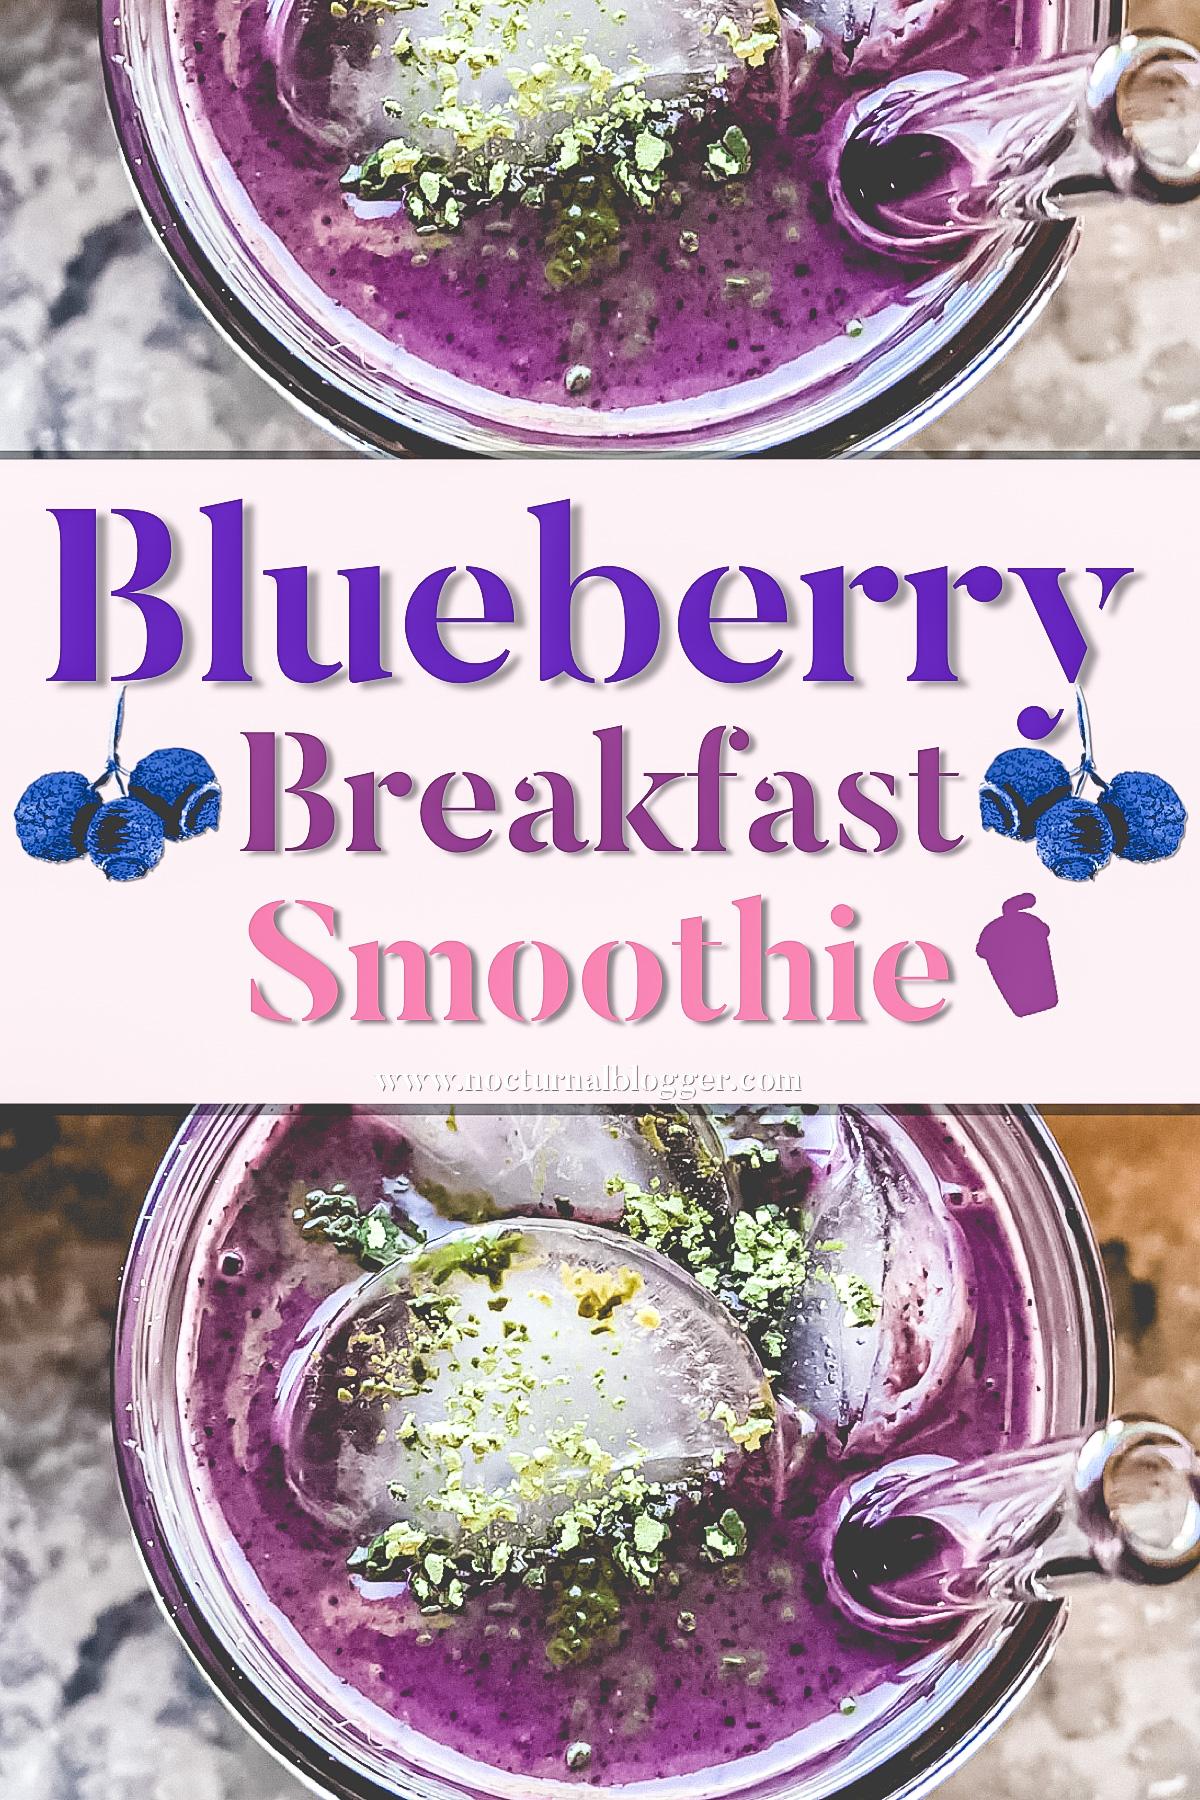 Blueberry Breakfast SmoothieRecipe